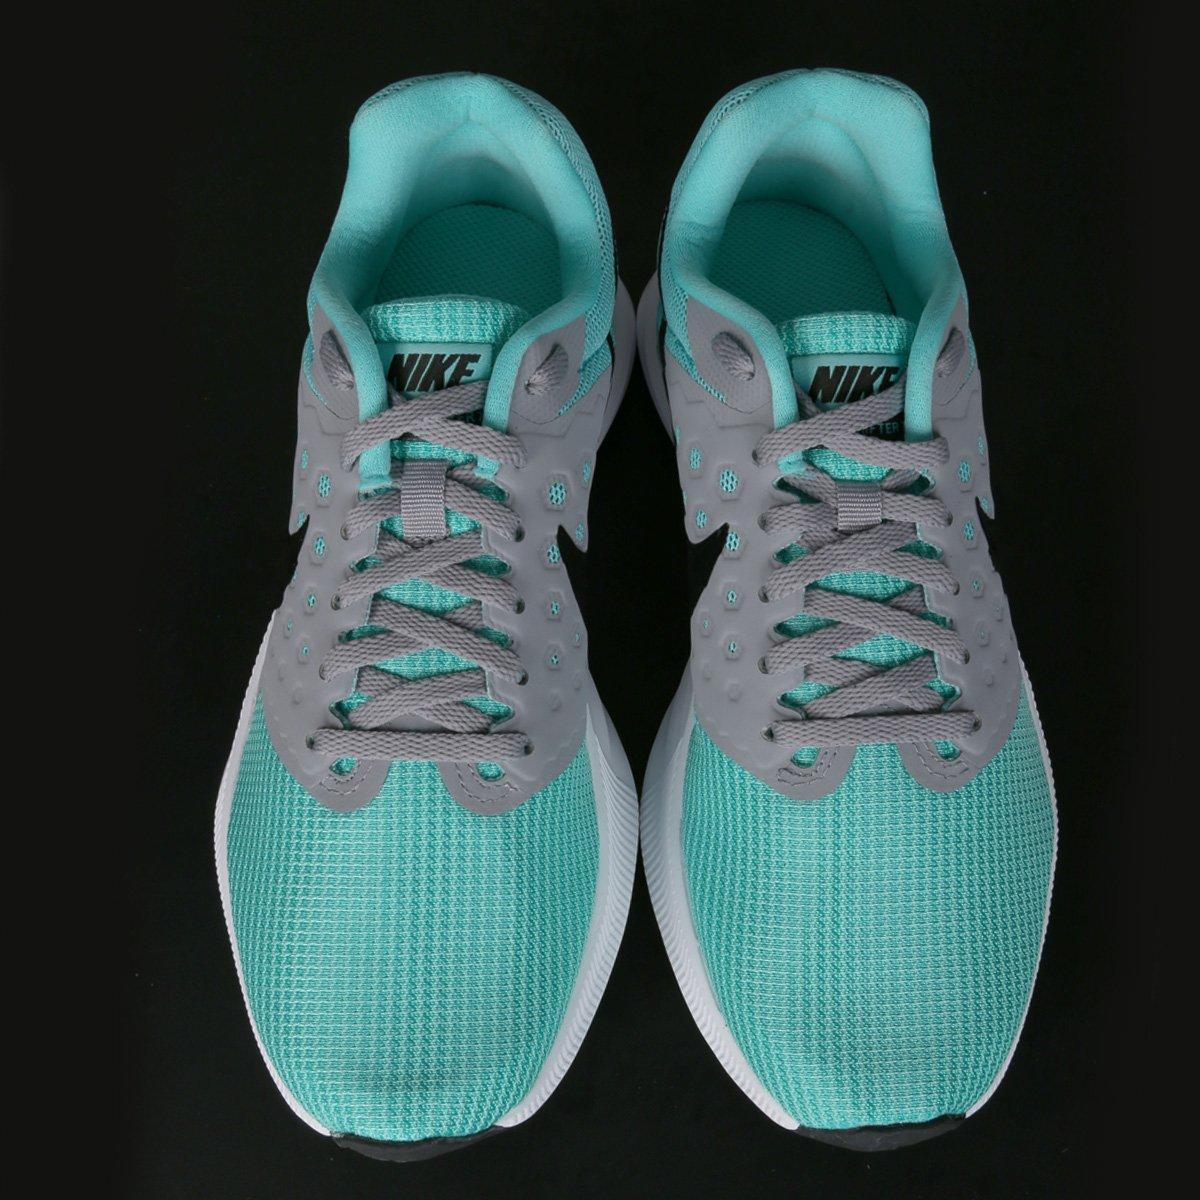 Tênis Nike Downshifter 7 Feminino  Tênis Nike Downshifter 7 Feminino ... 7a4ec96a2d411